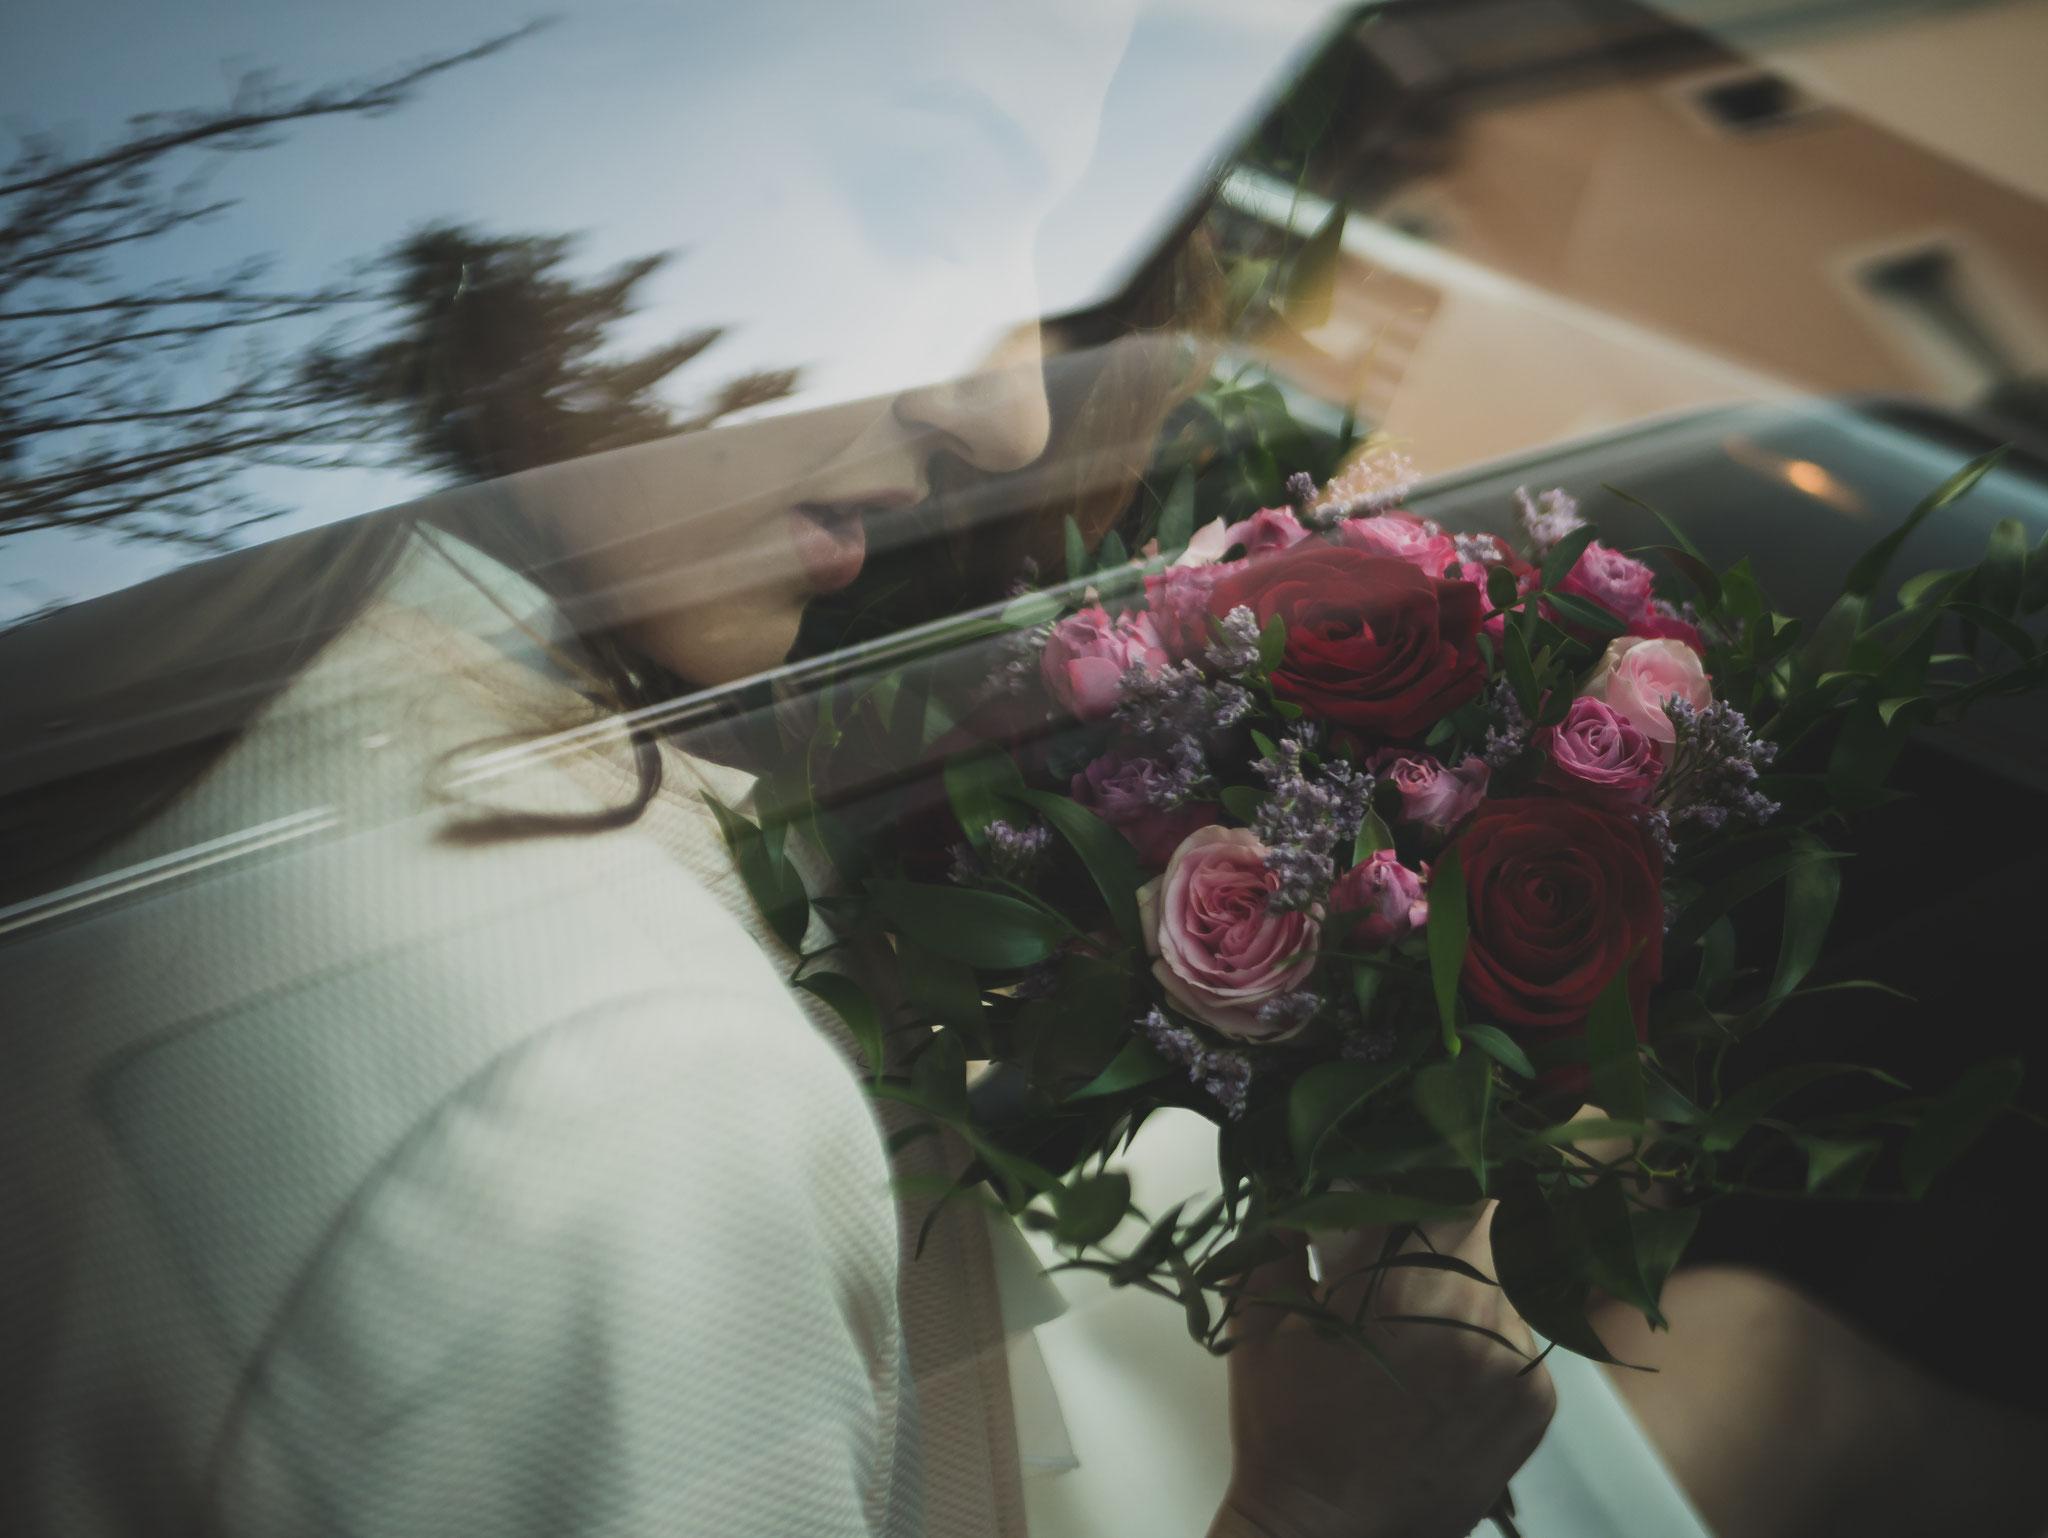 Salt & Pepper Photography: Hochzeitsfotografen in Dresden | After-Wedding-Shoot mit Tanya & Sascha